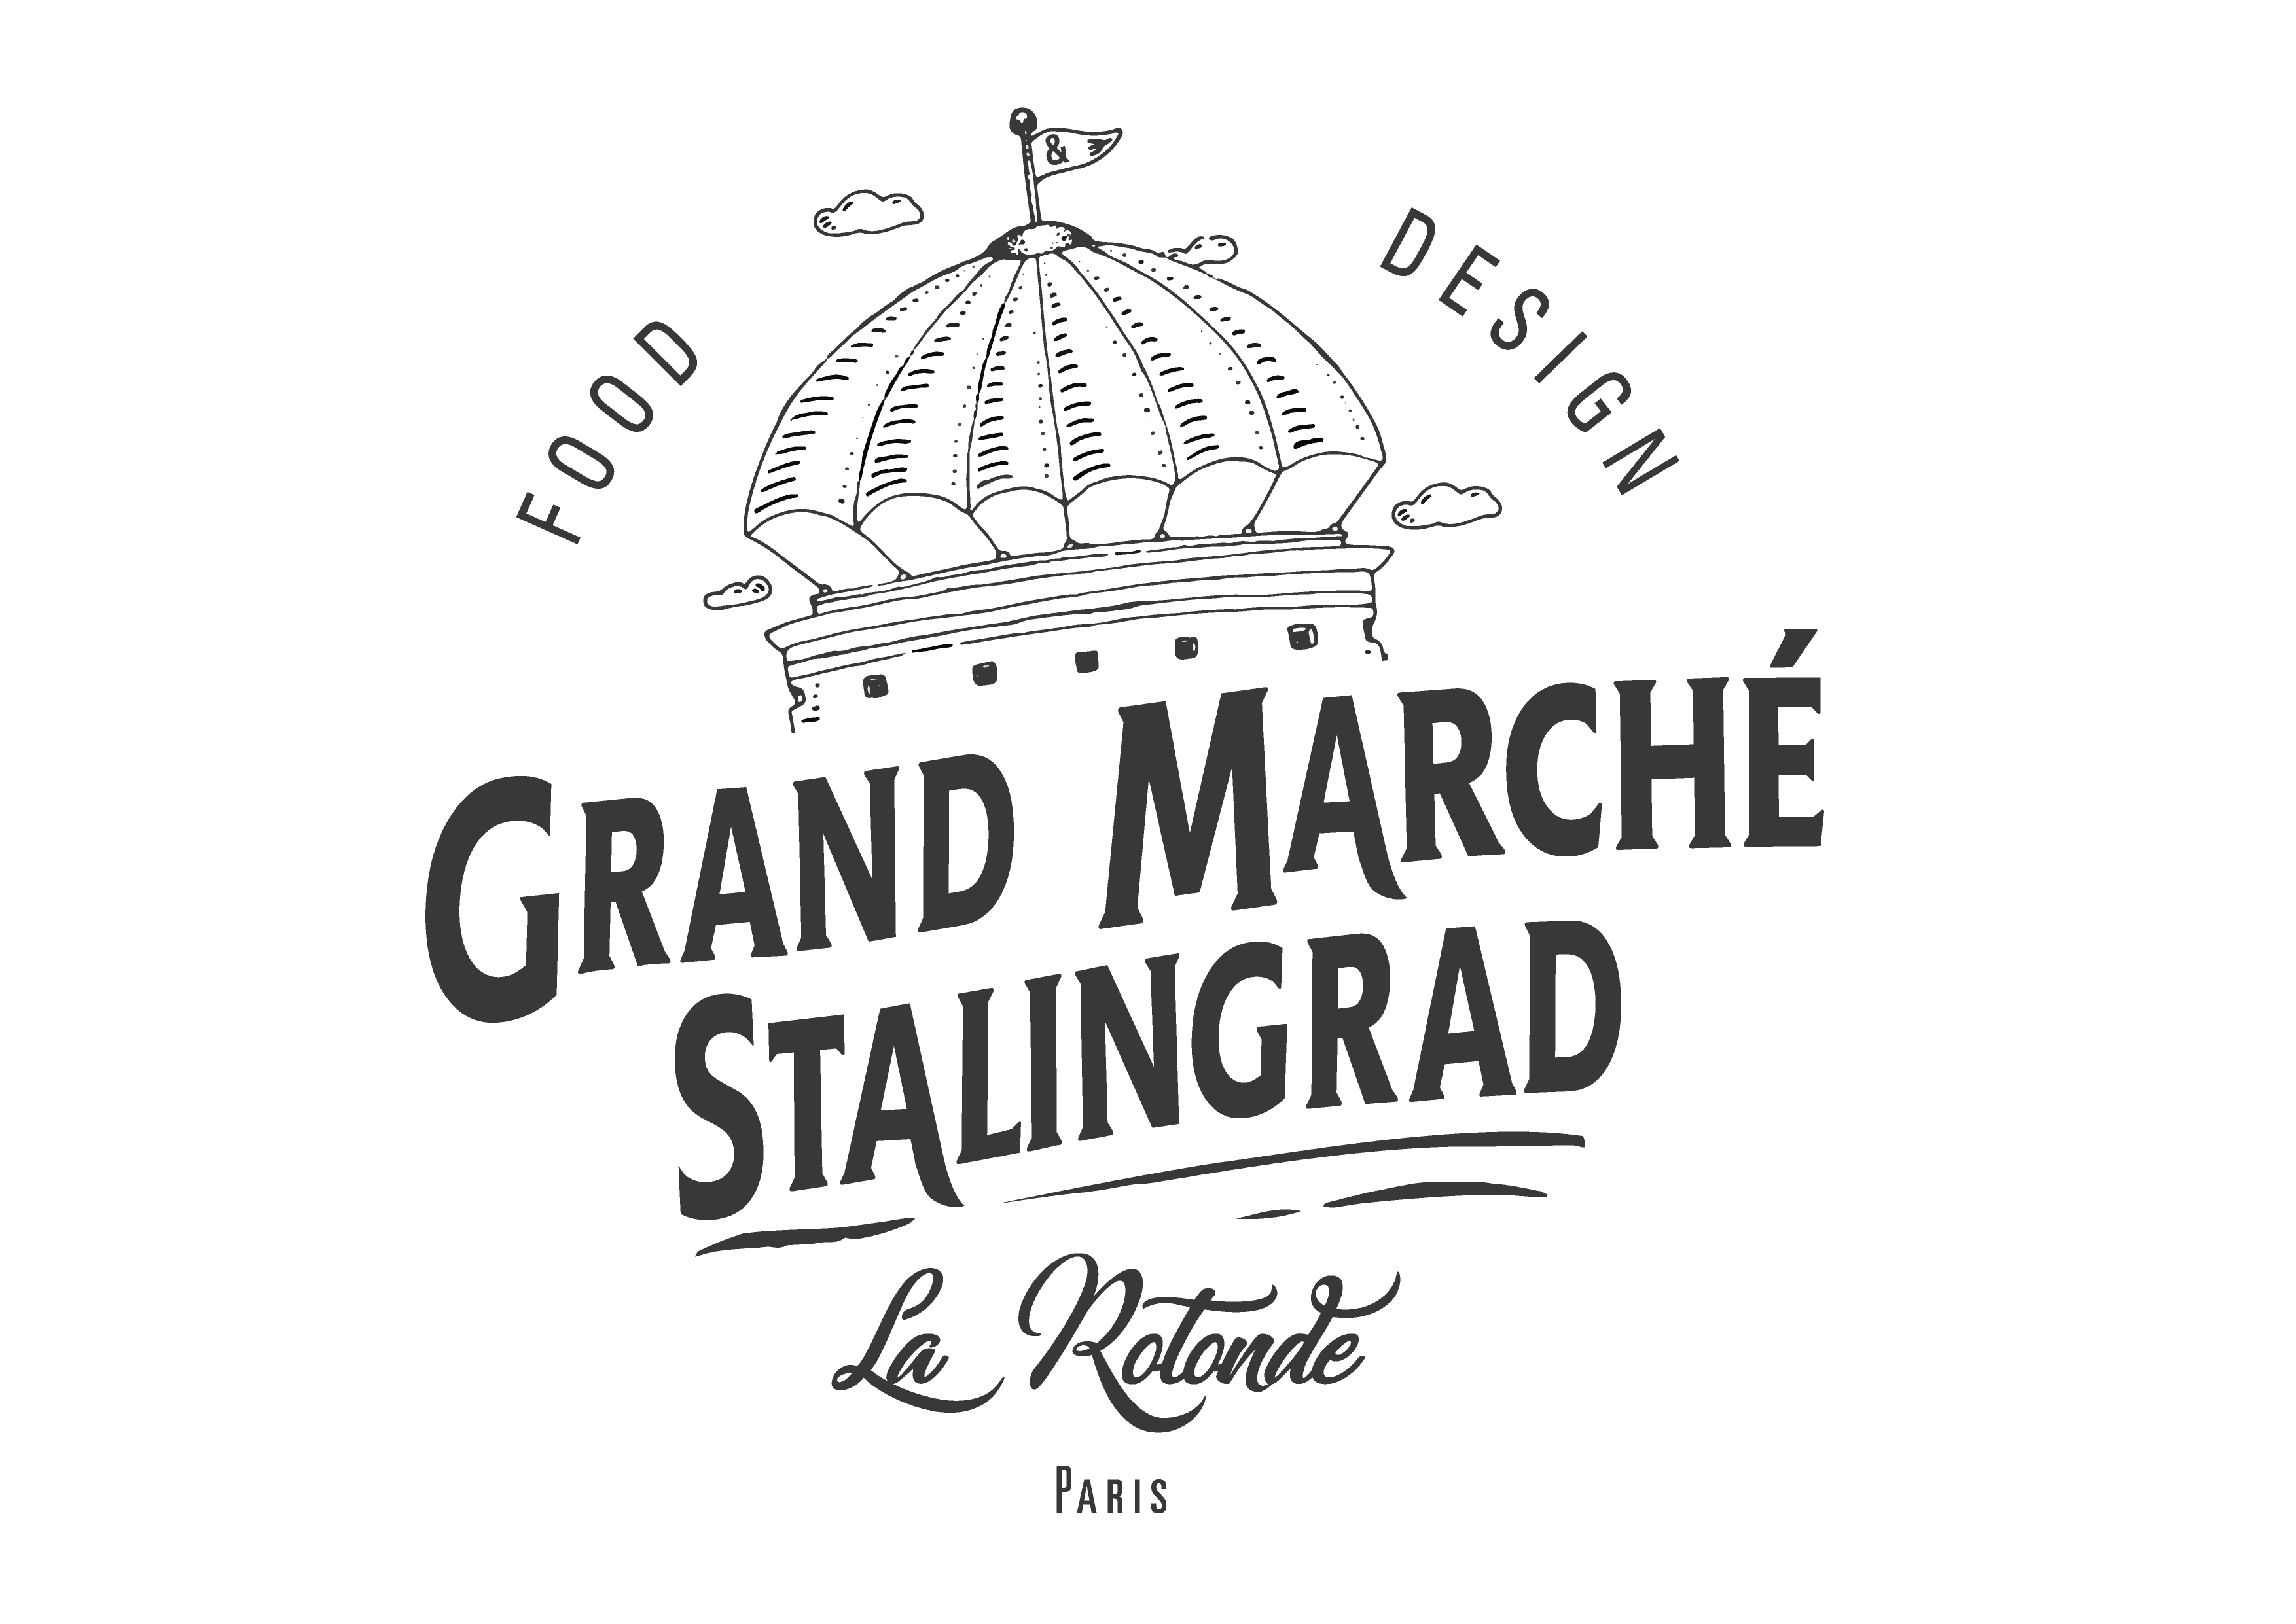 GRAND MARCHÉ STALINGRAD